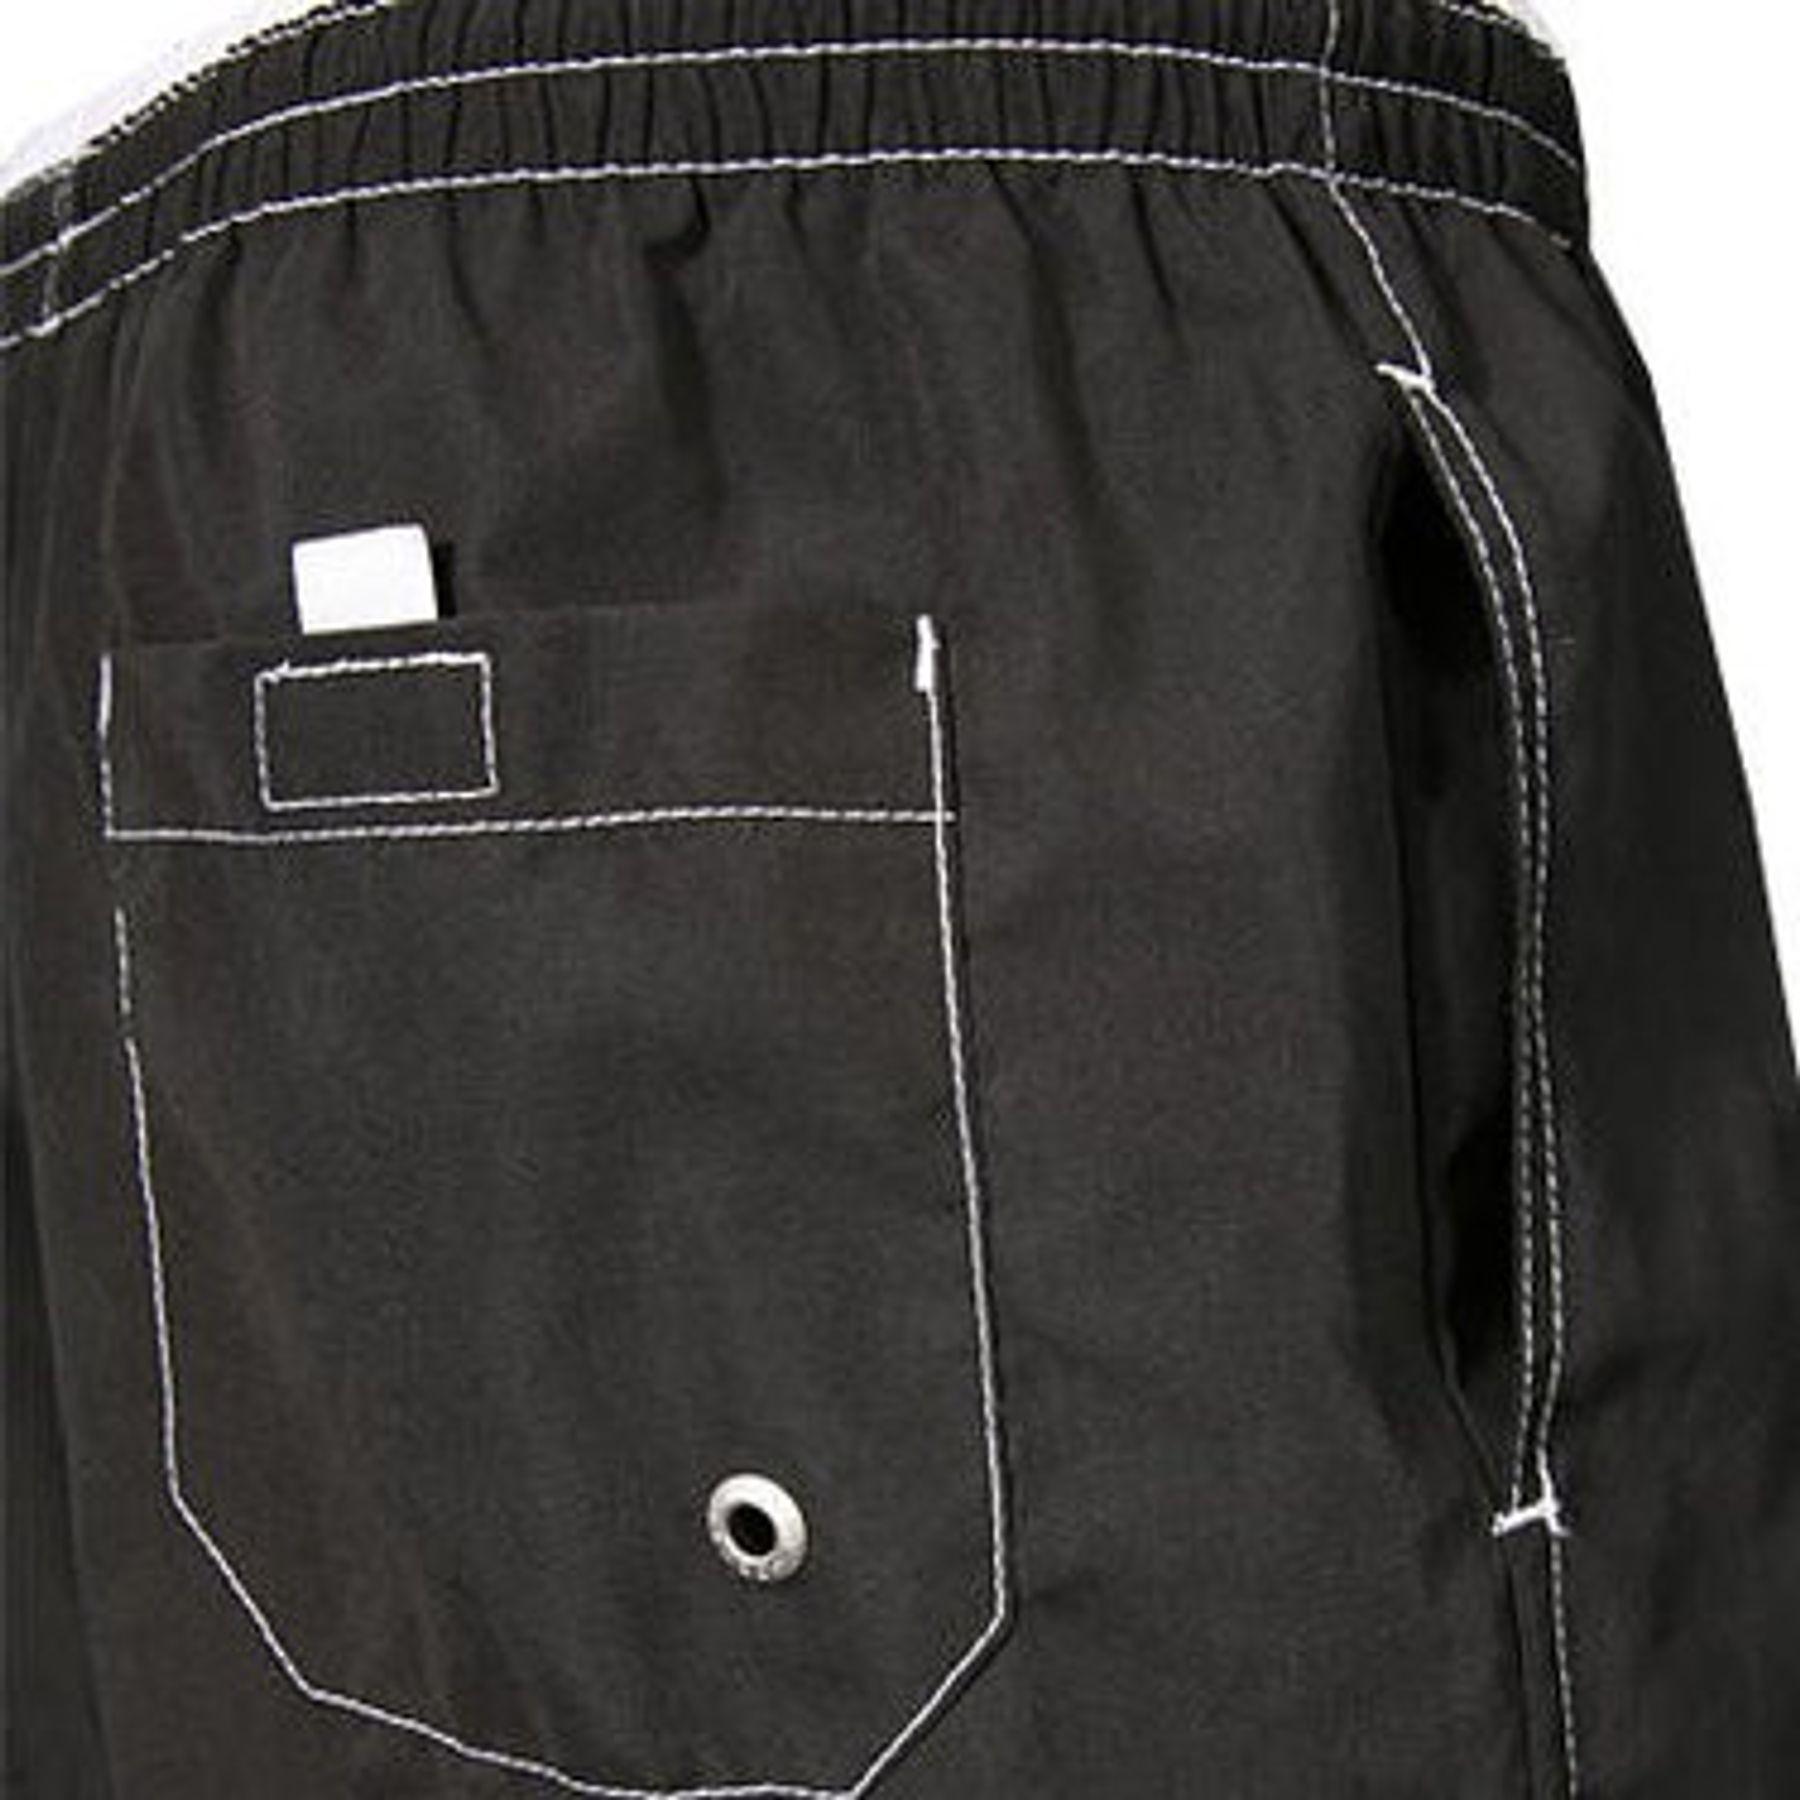 Jockey - Herren Long-Short USA Originals, Beachwear (60013) in 3 Farben – Bild 6